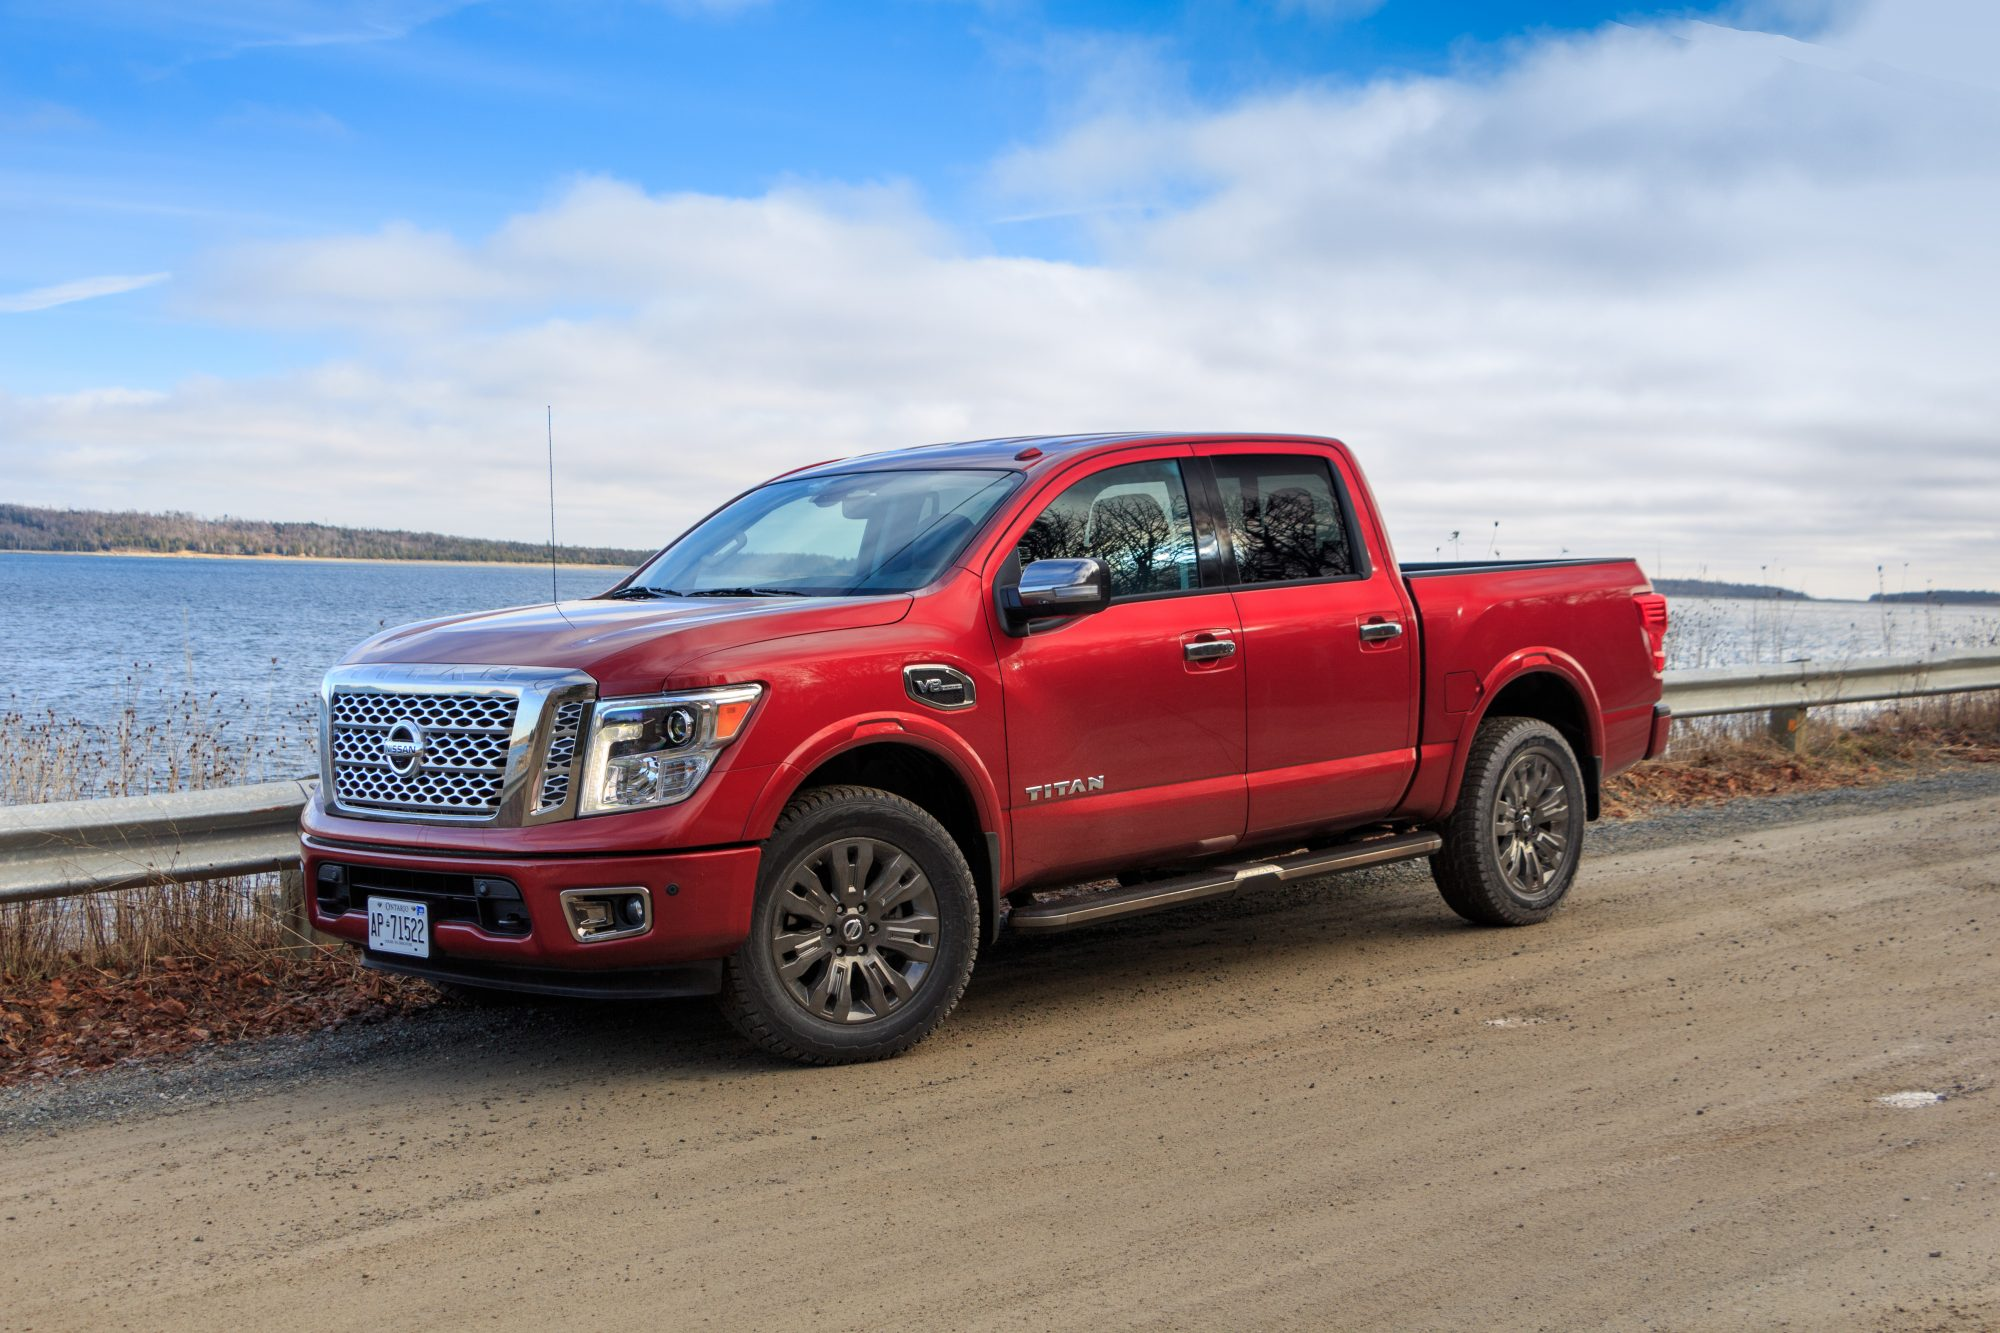 Driven: 2017 Nissan Titan Platinum Reserve